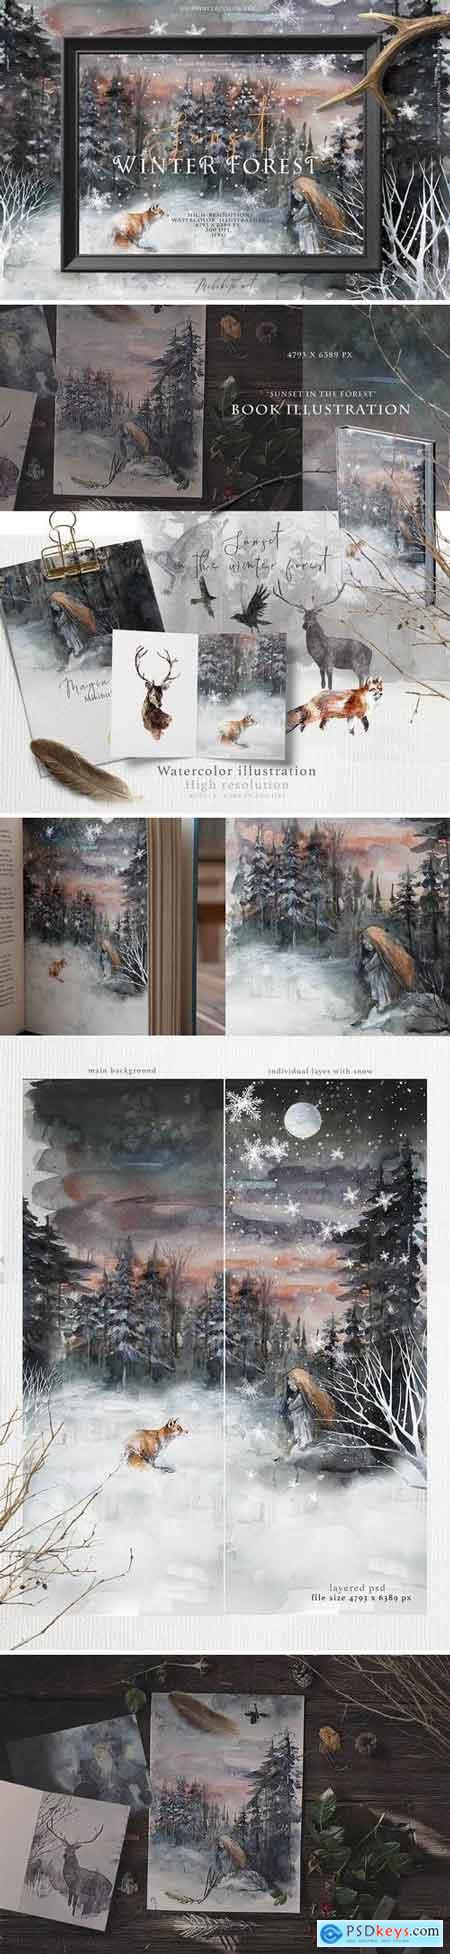 Book illustration psd, jpeg